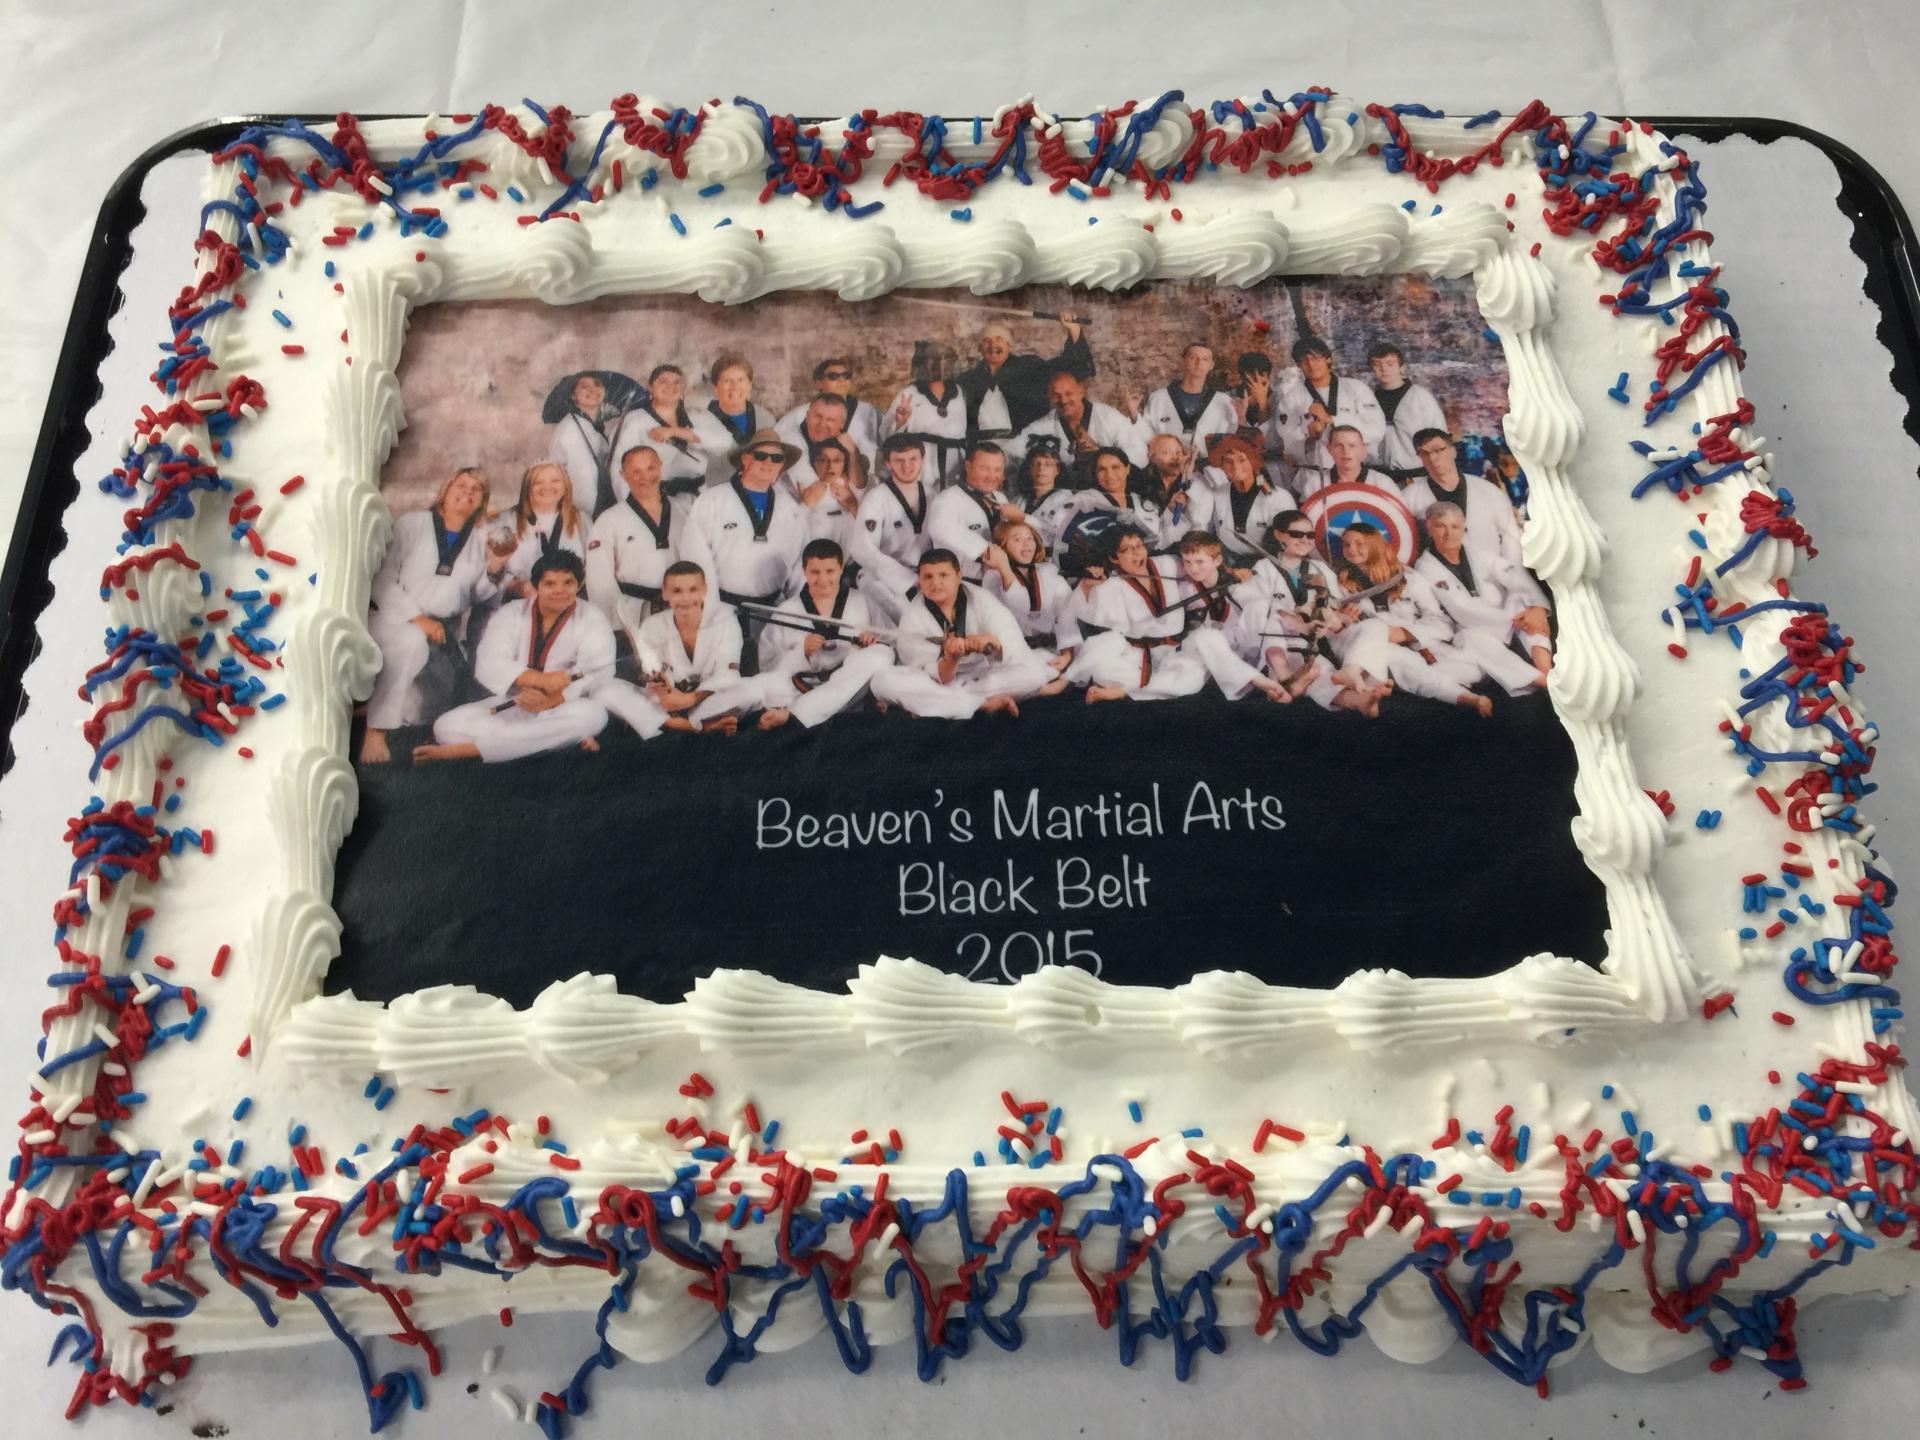 Black Belt Funny Picture Cake